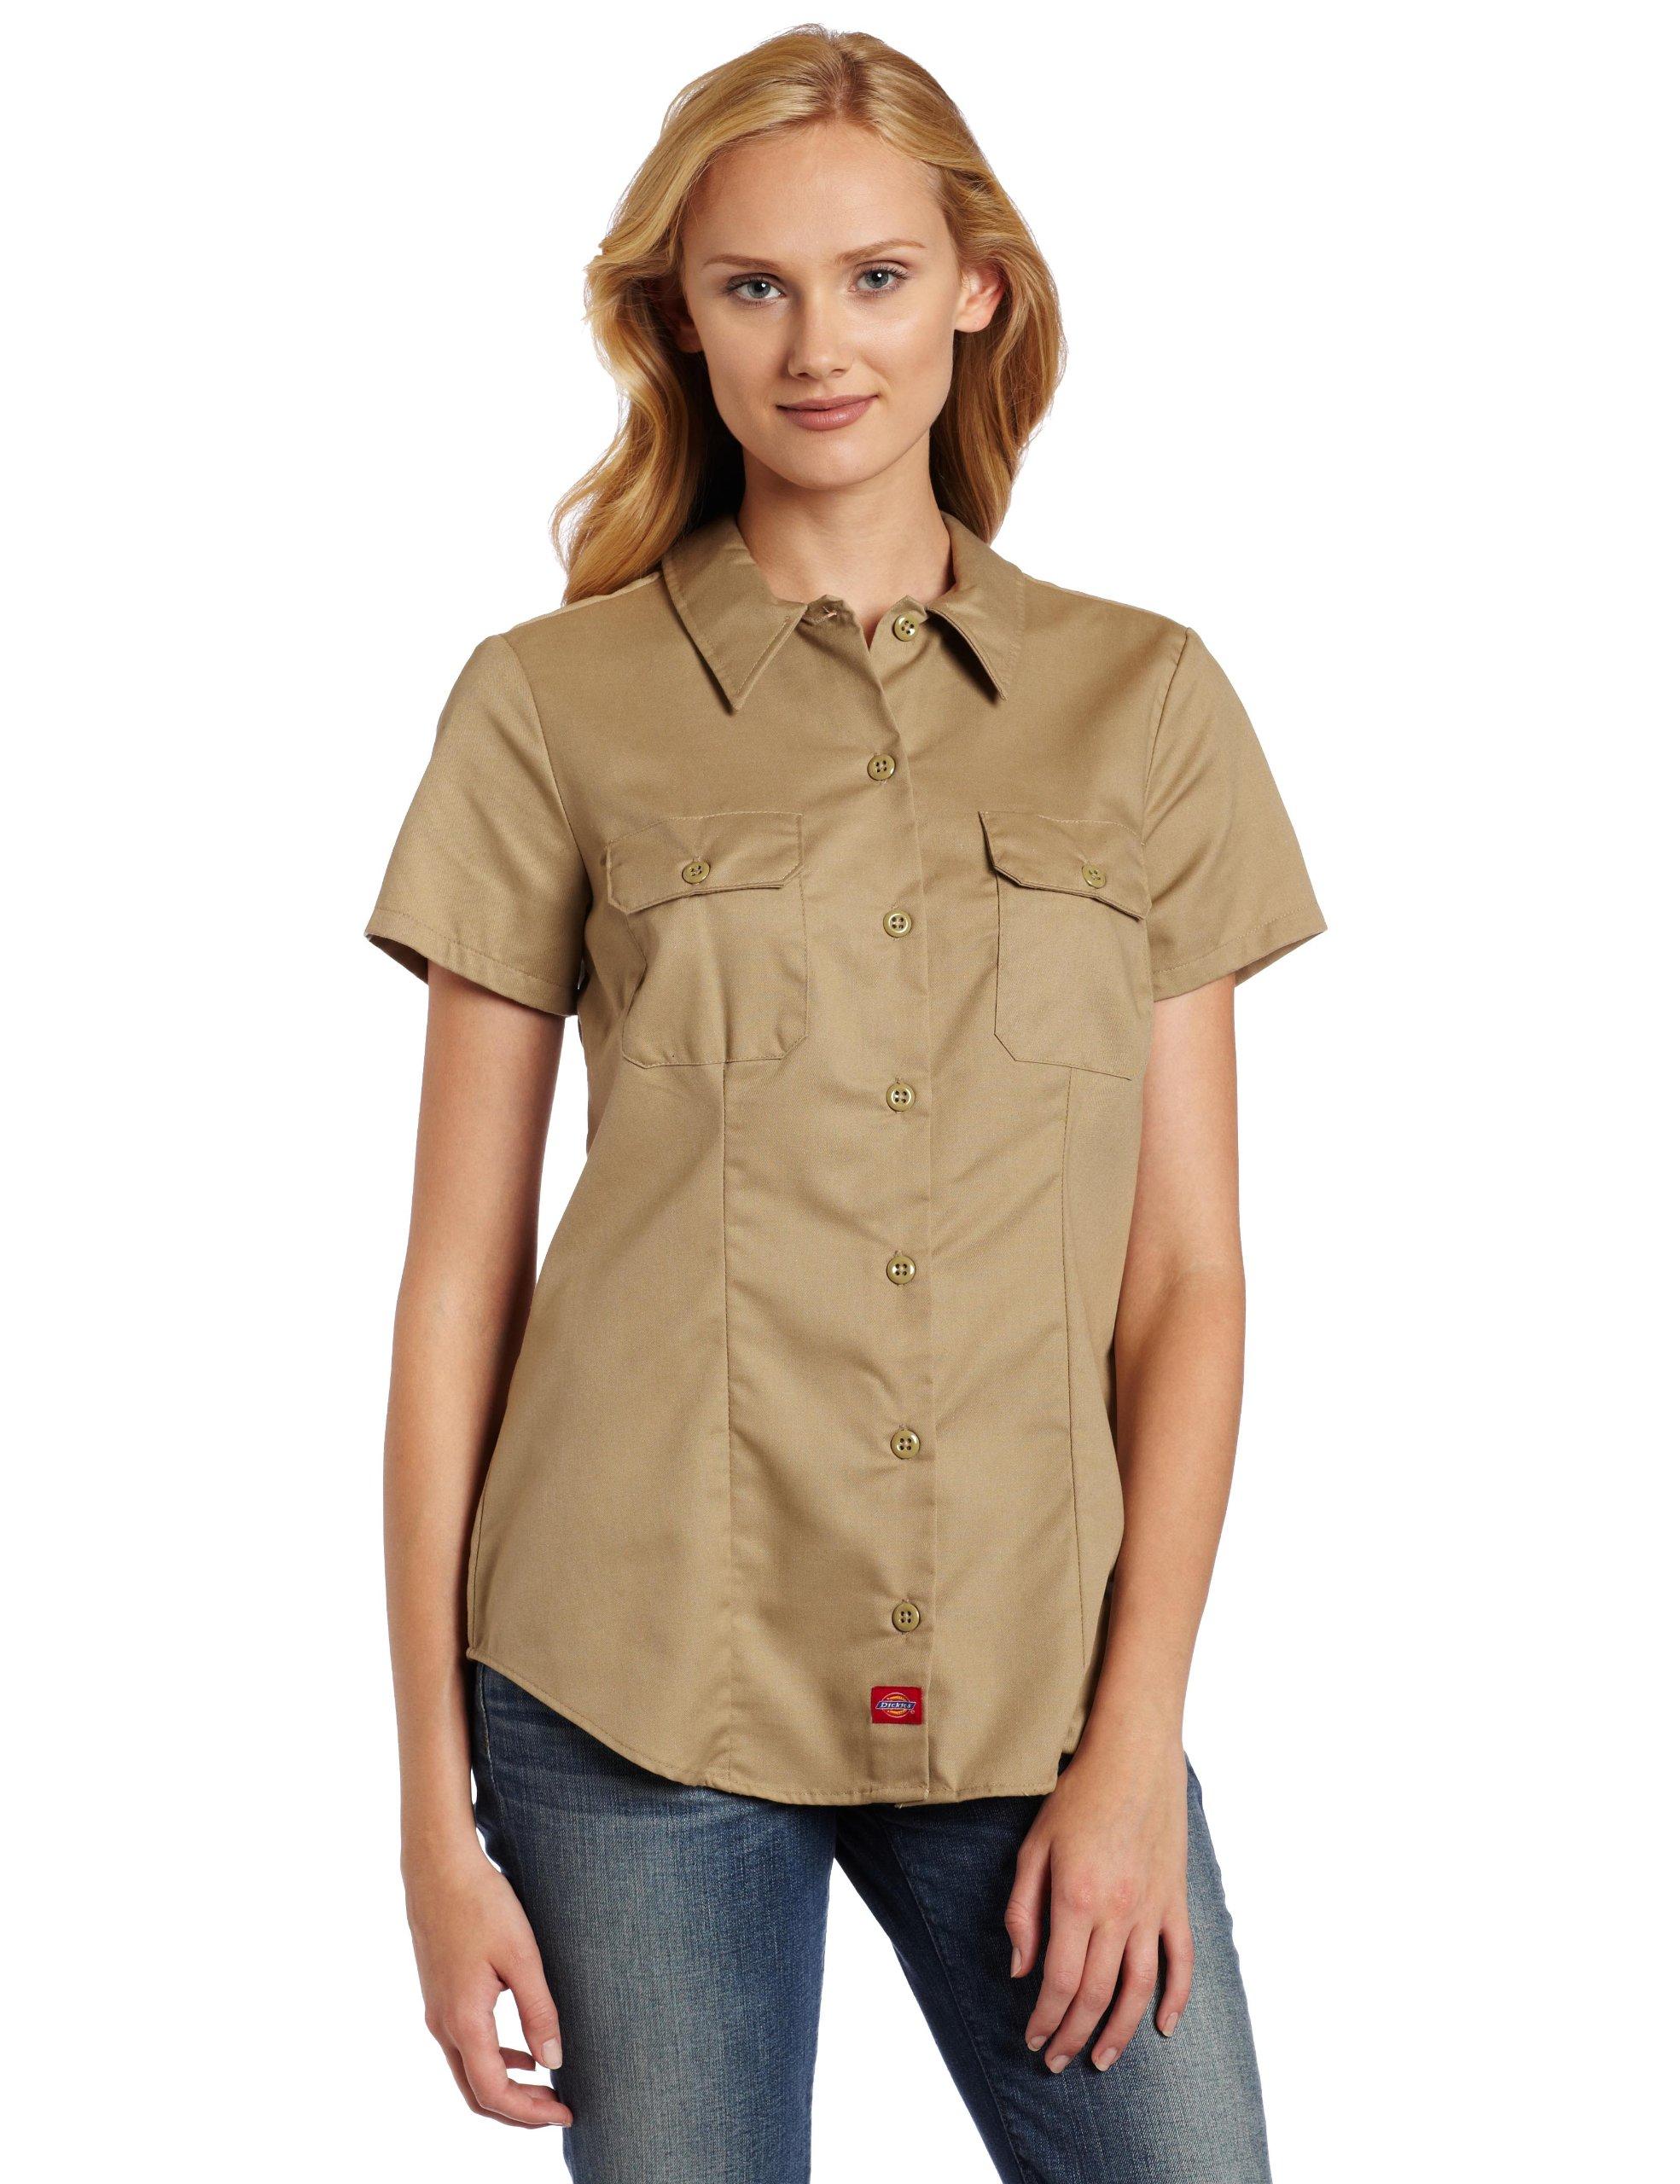 Dickies Women's Short-Sleeve Work Shirt, Khaki, X-Large by dickies